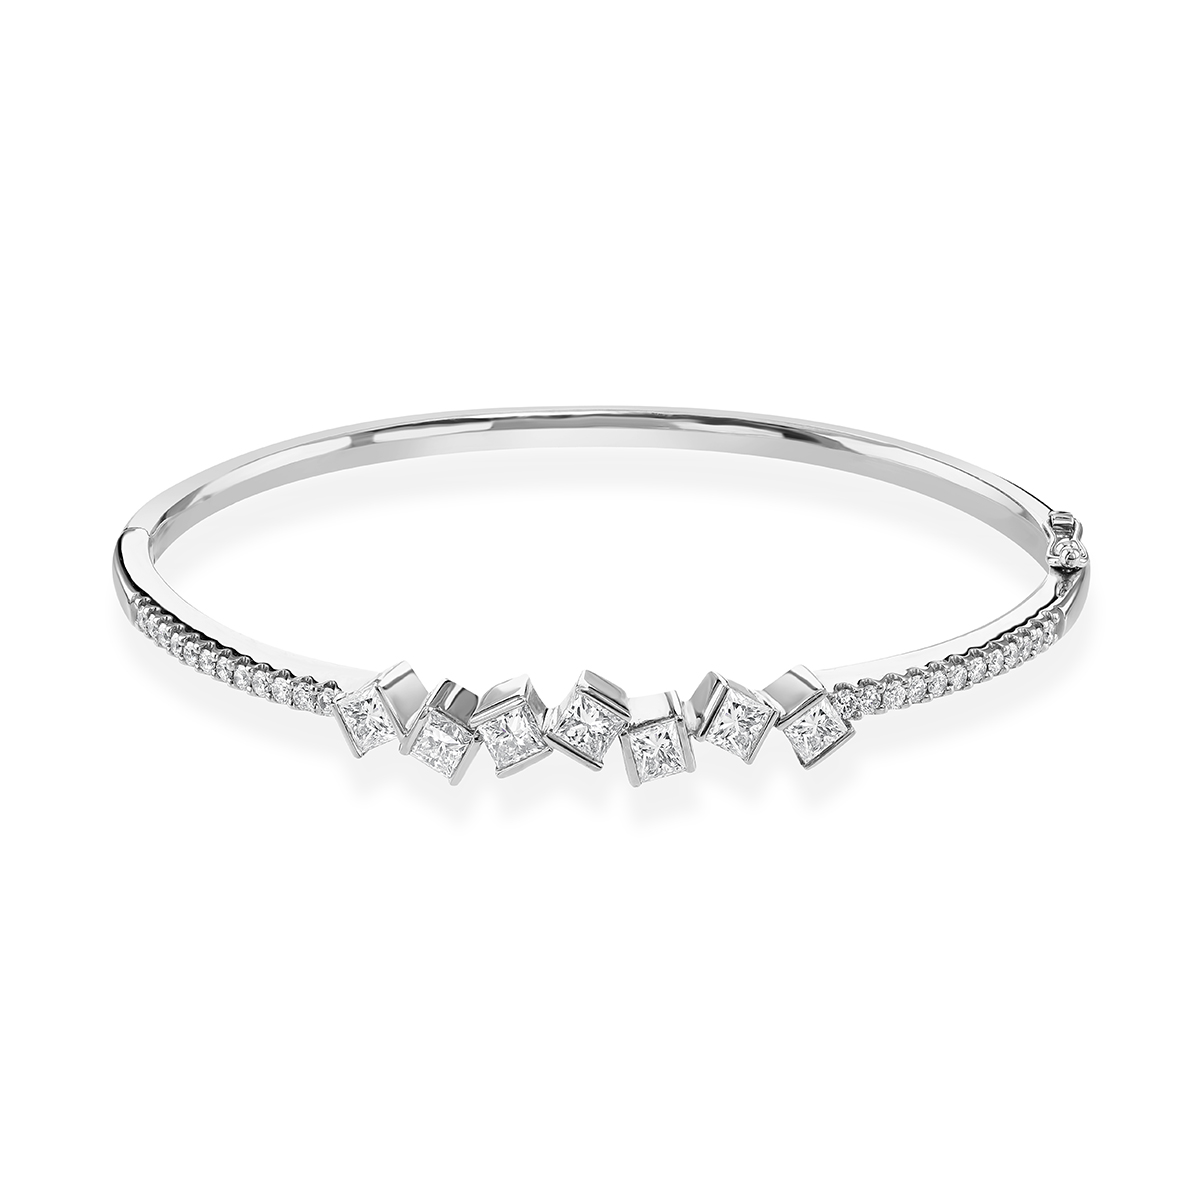 Hopscotch White Gold Diamond Bangle